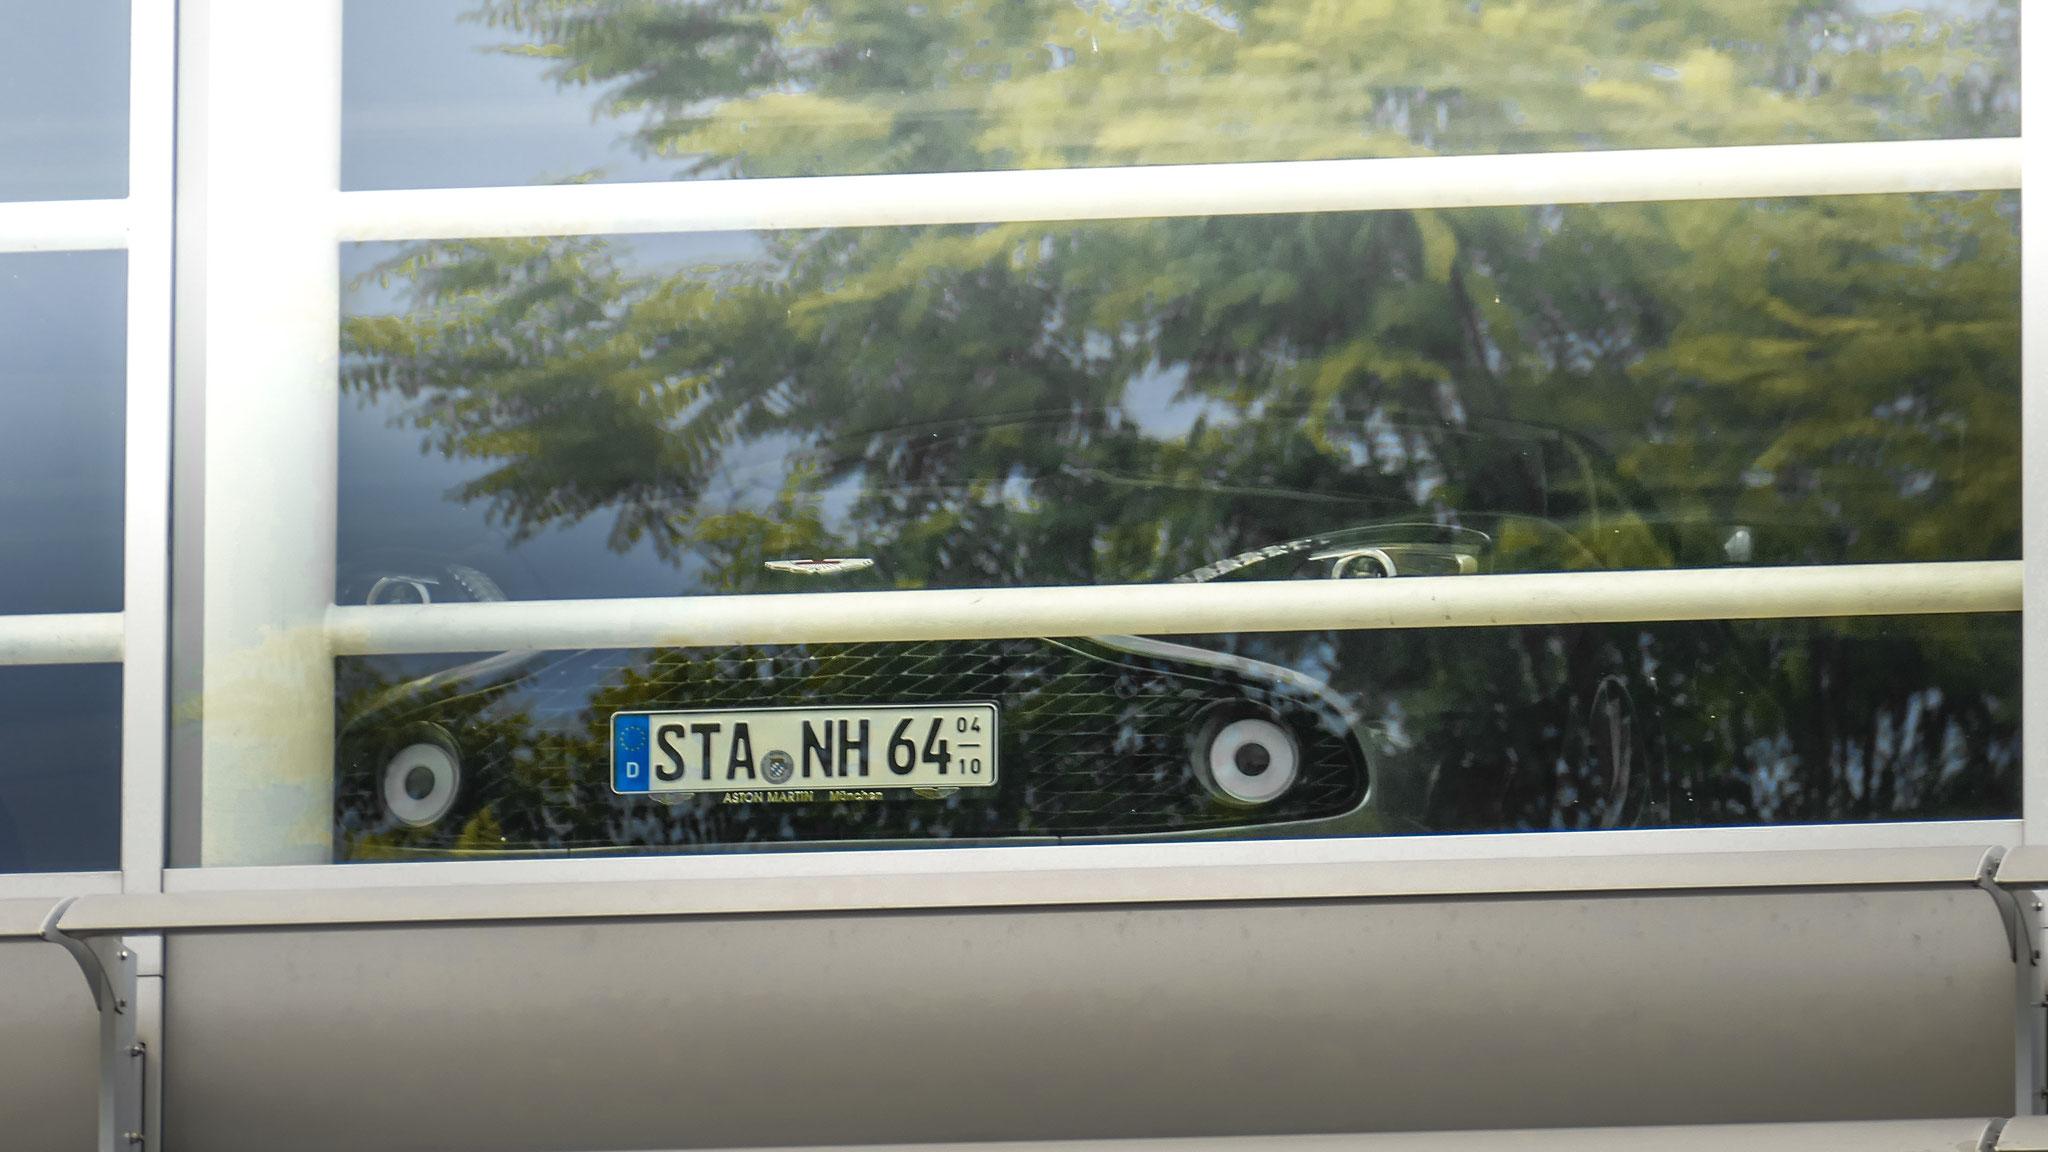 Aston Martin Vanquish Zagato Volante - STA-NH-64